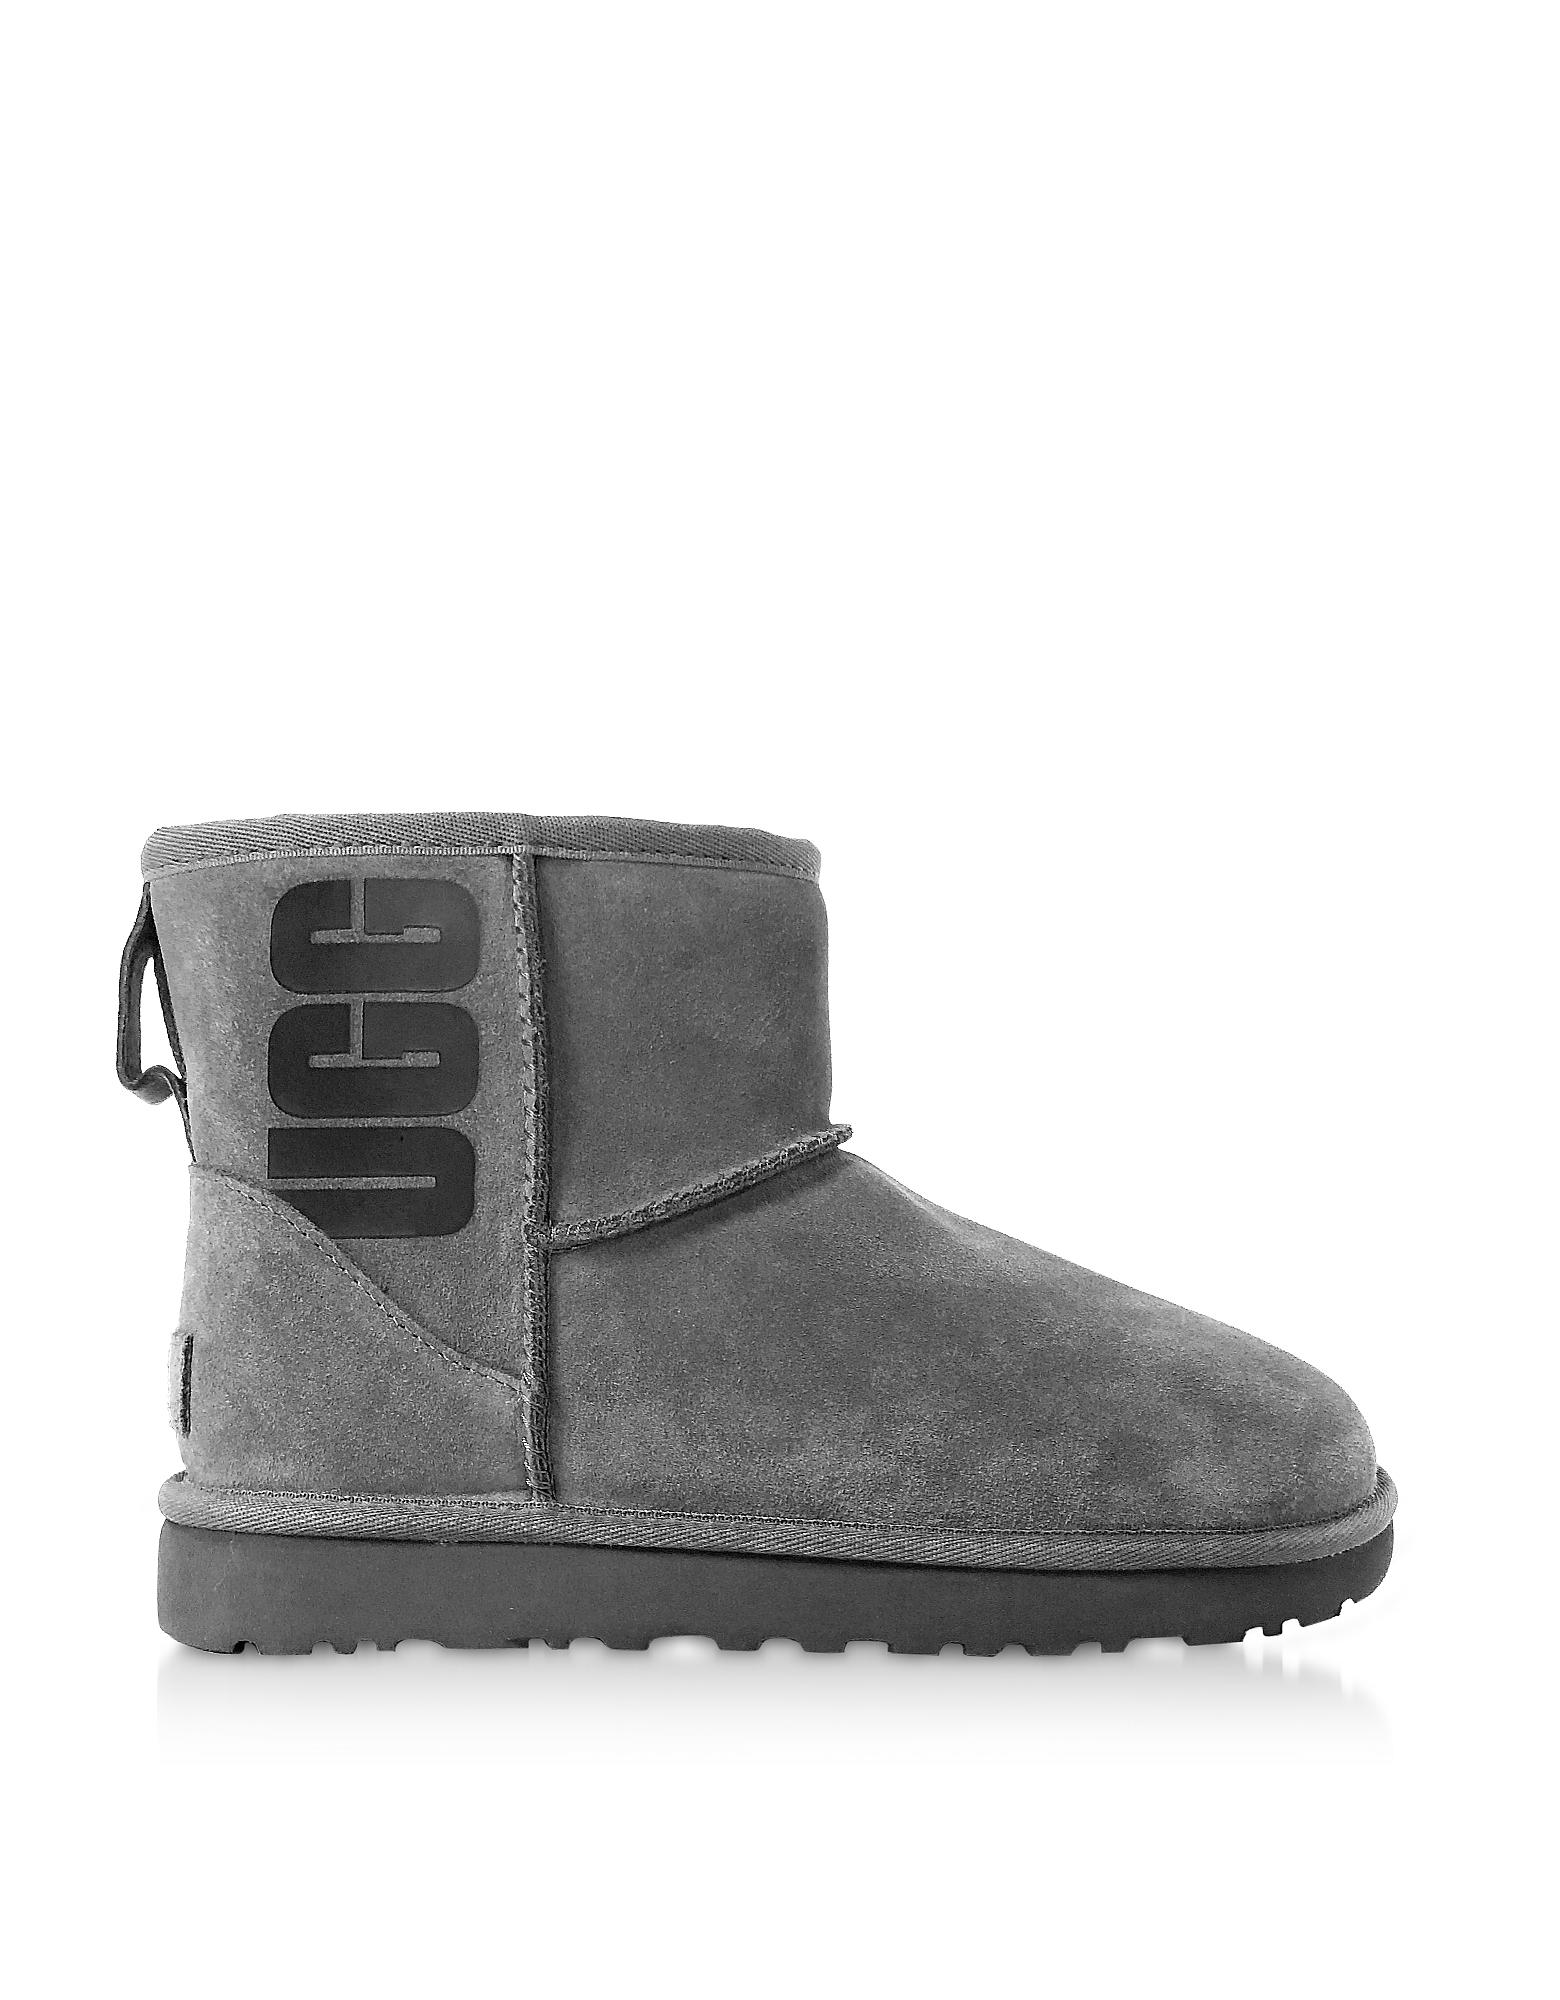 UGG Designer Shoes, Grey Mini Classic Ugg Rubber Logo Boots